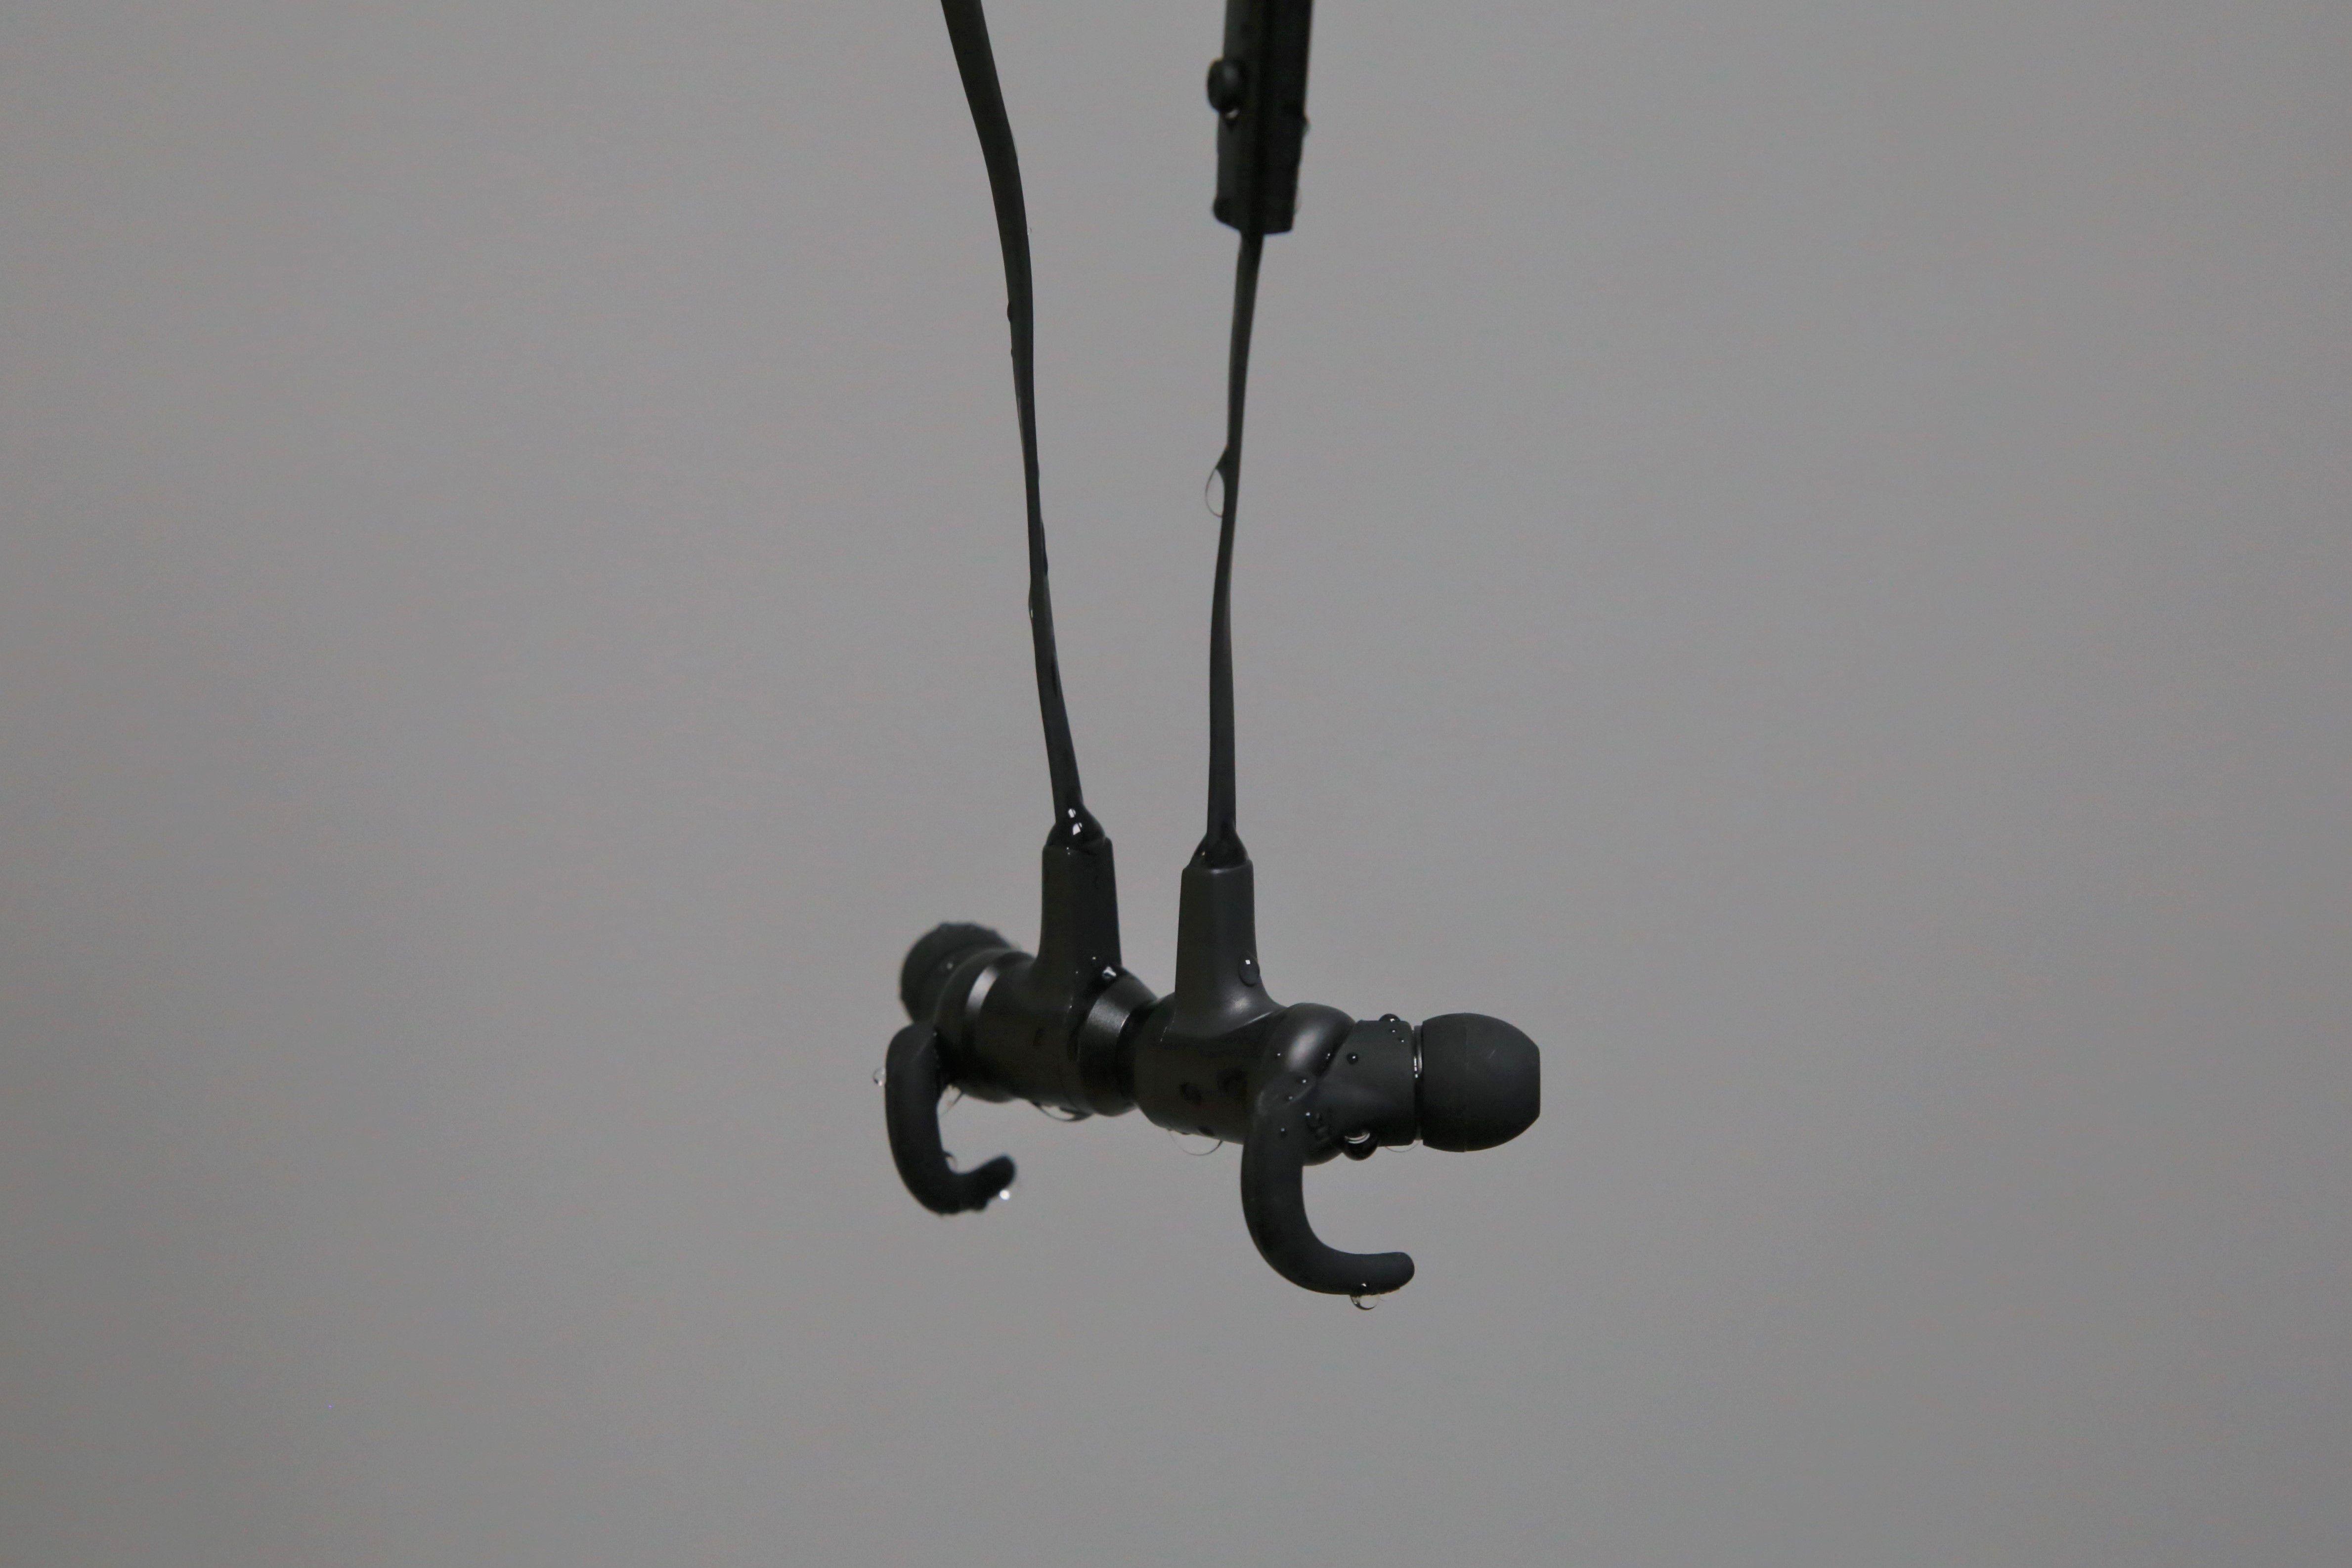 VAVA MOOV 28 磁吸藍牙耳機推薦 - 防水IPX6